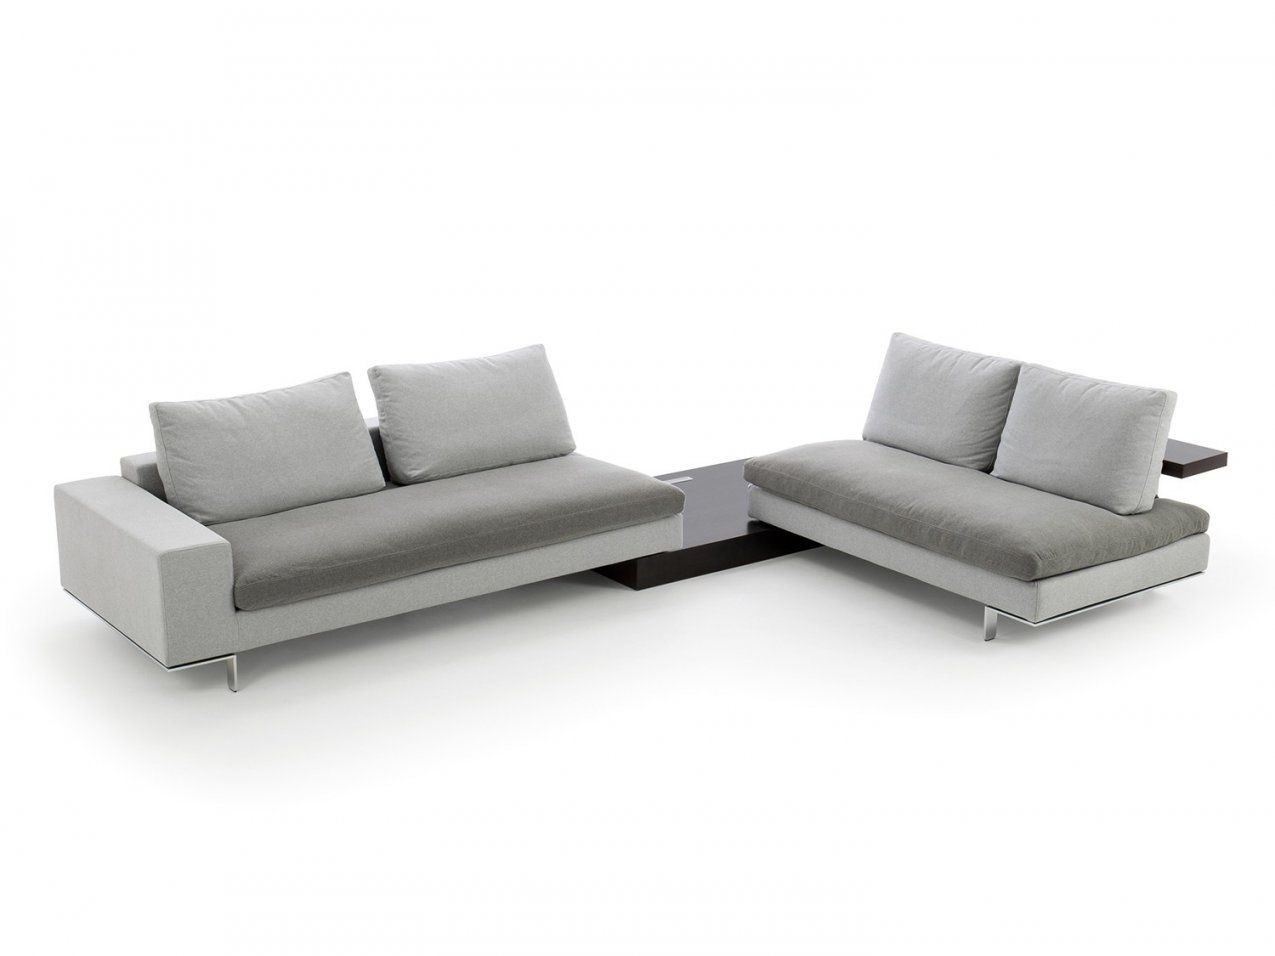 Freesofa Modulares Sofa Mit Integriertem Tisch  Homeplaneur von Sofa Mit Integriertem Tisch Bild